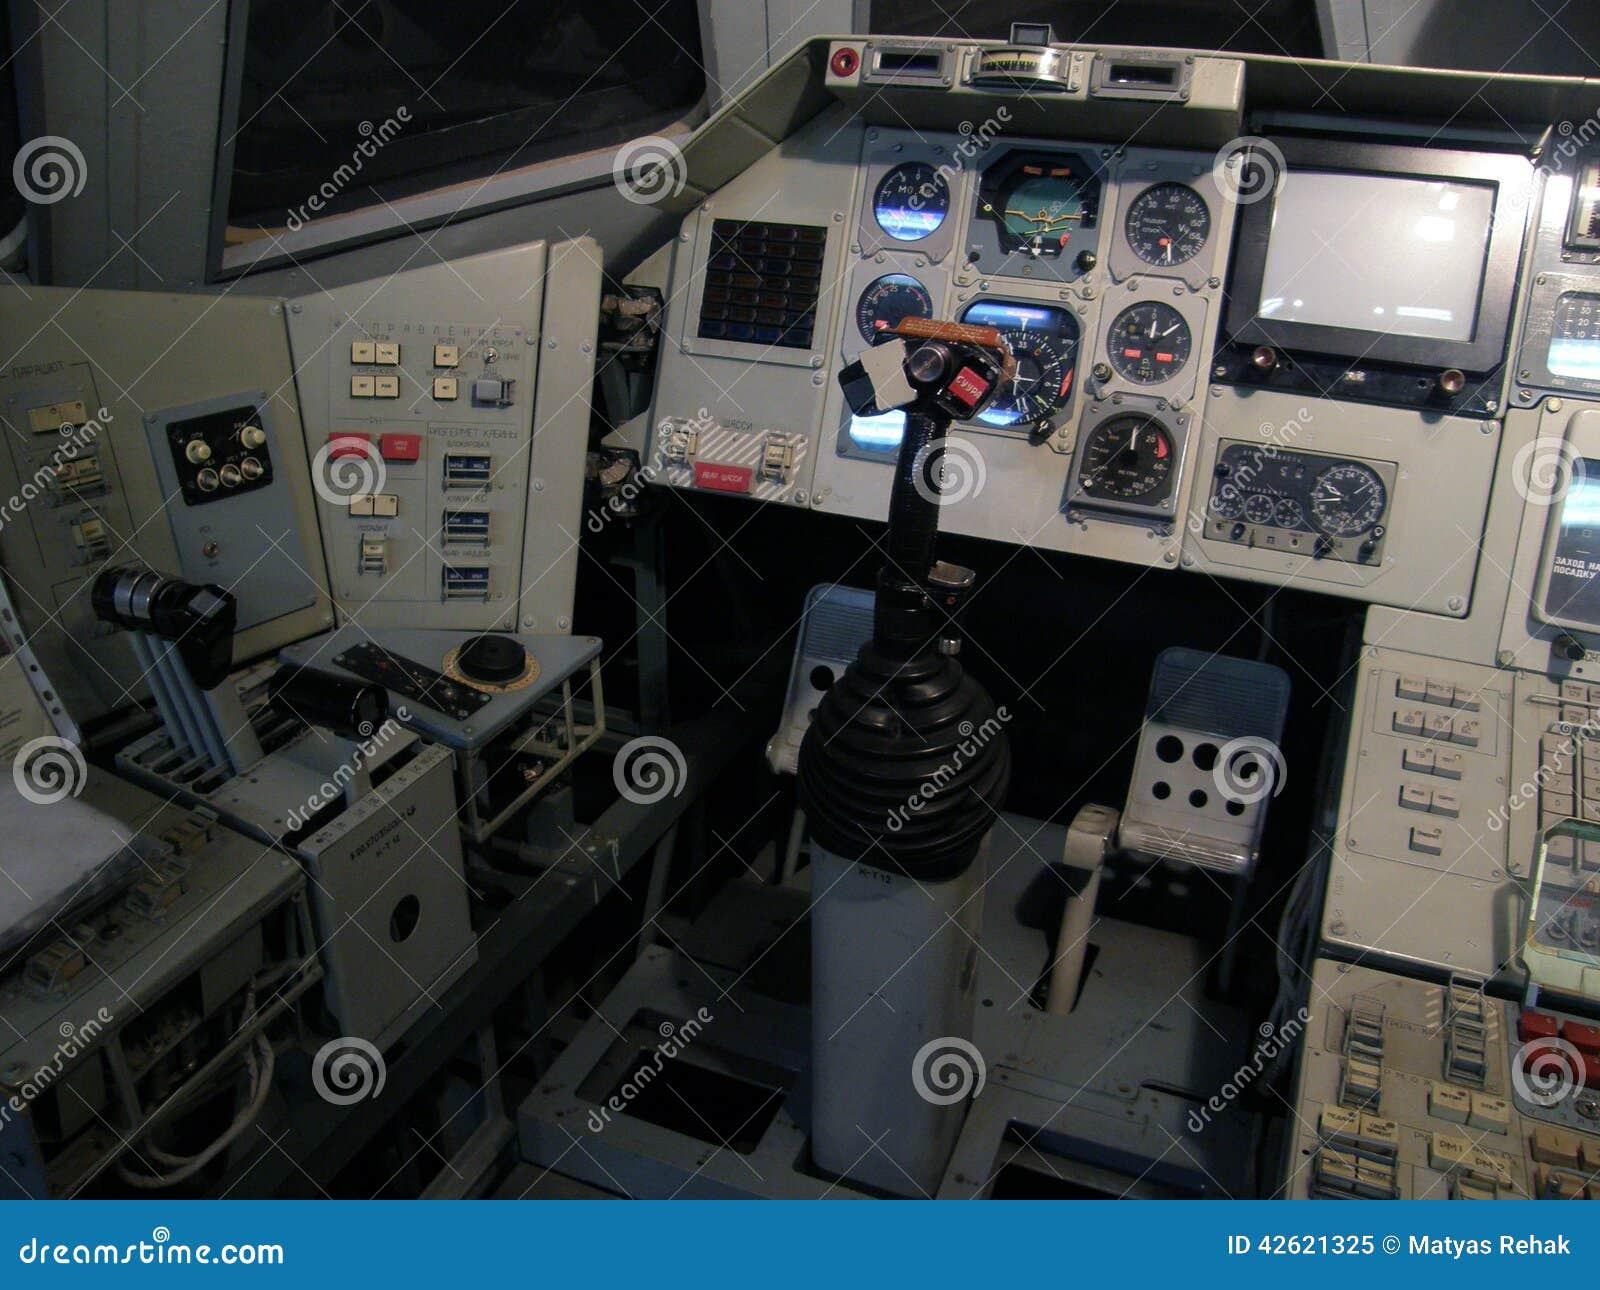 space shuttle challenger cockpit audio - photo #30